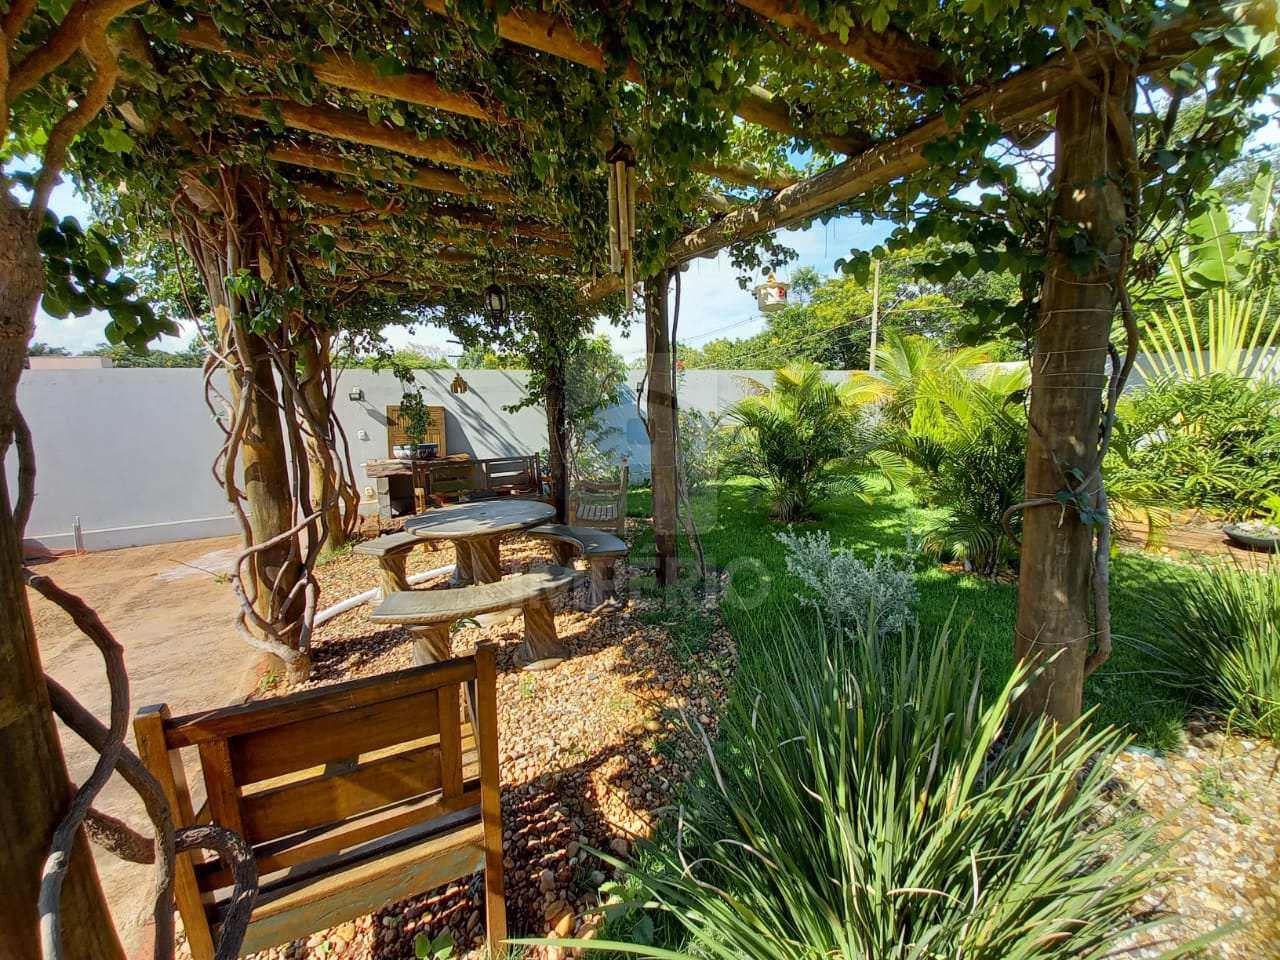 Casa com 3 dorms, Parque Residencial Primavera II, Jaú - R$ 800 mil, Cod: 448